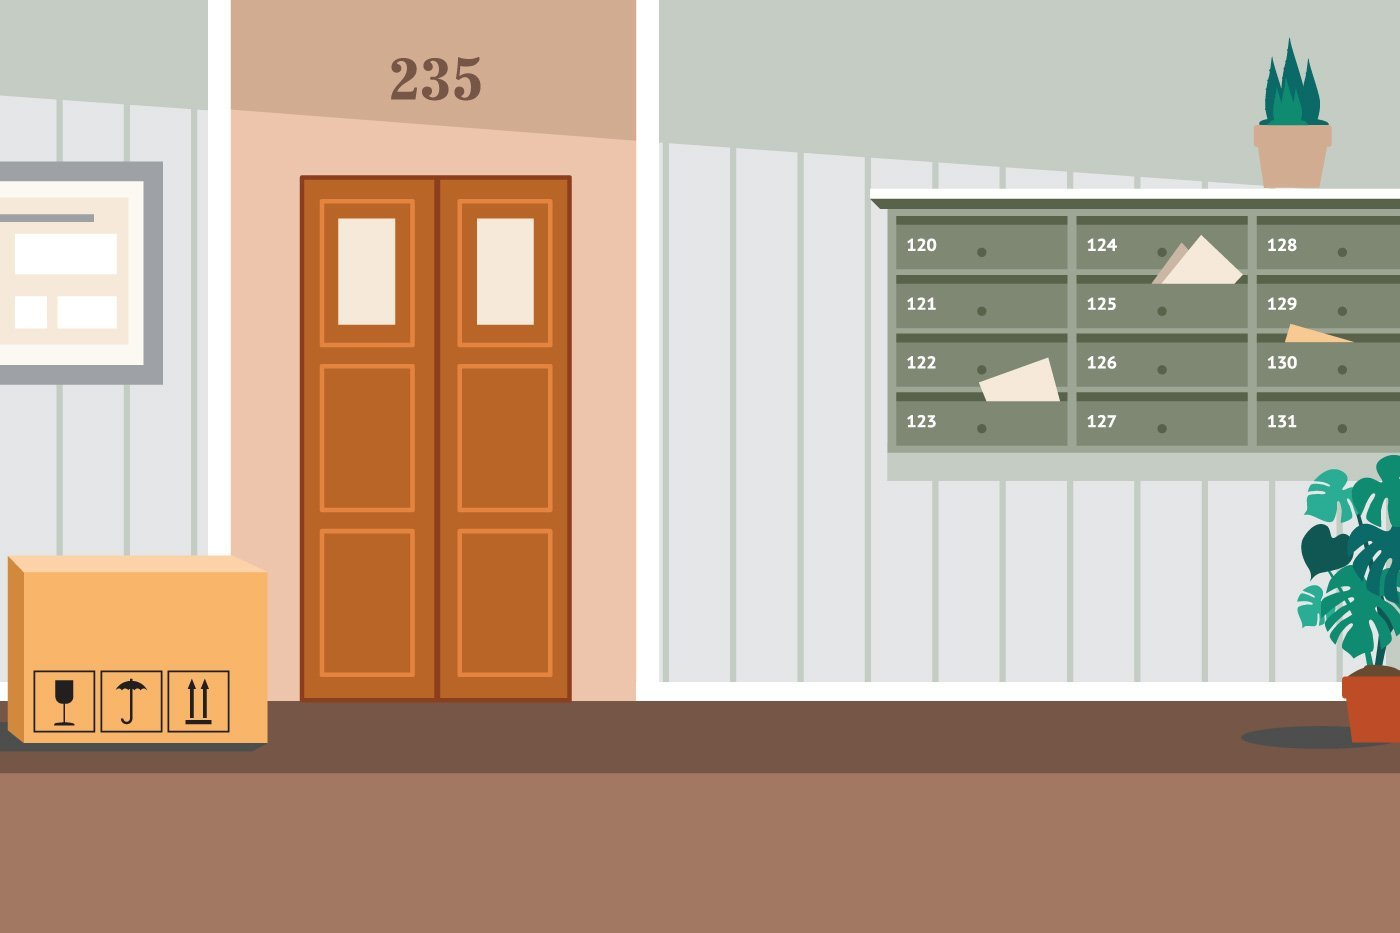 Illustration - Vector graphics